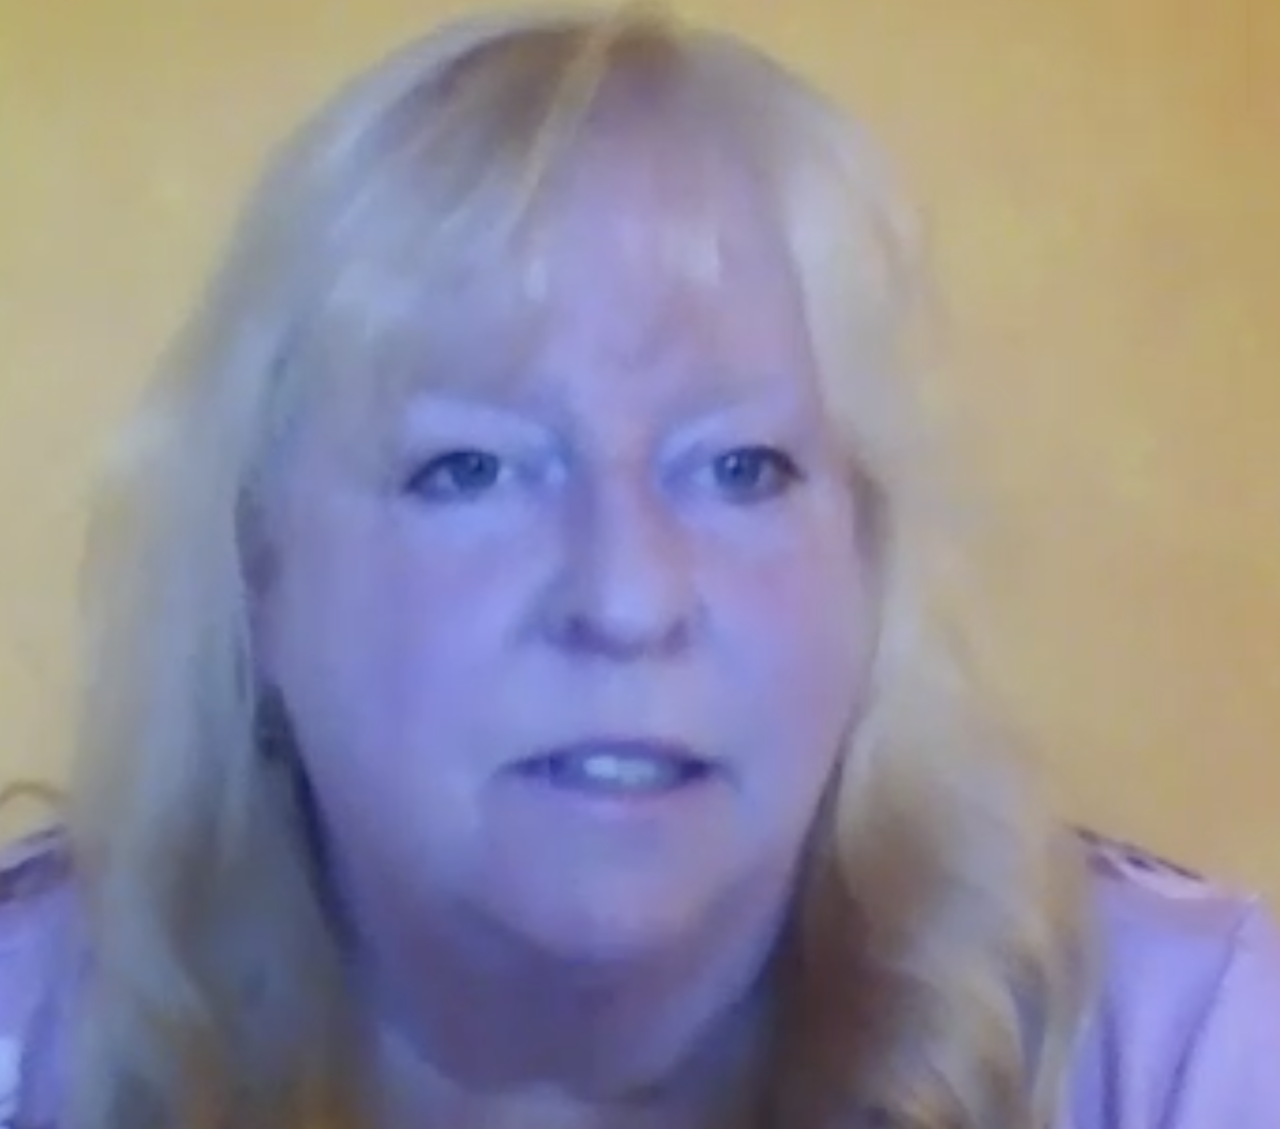 Marianne Halbert, NAMI Indiana's criminal justice director